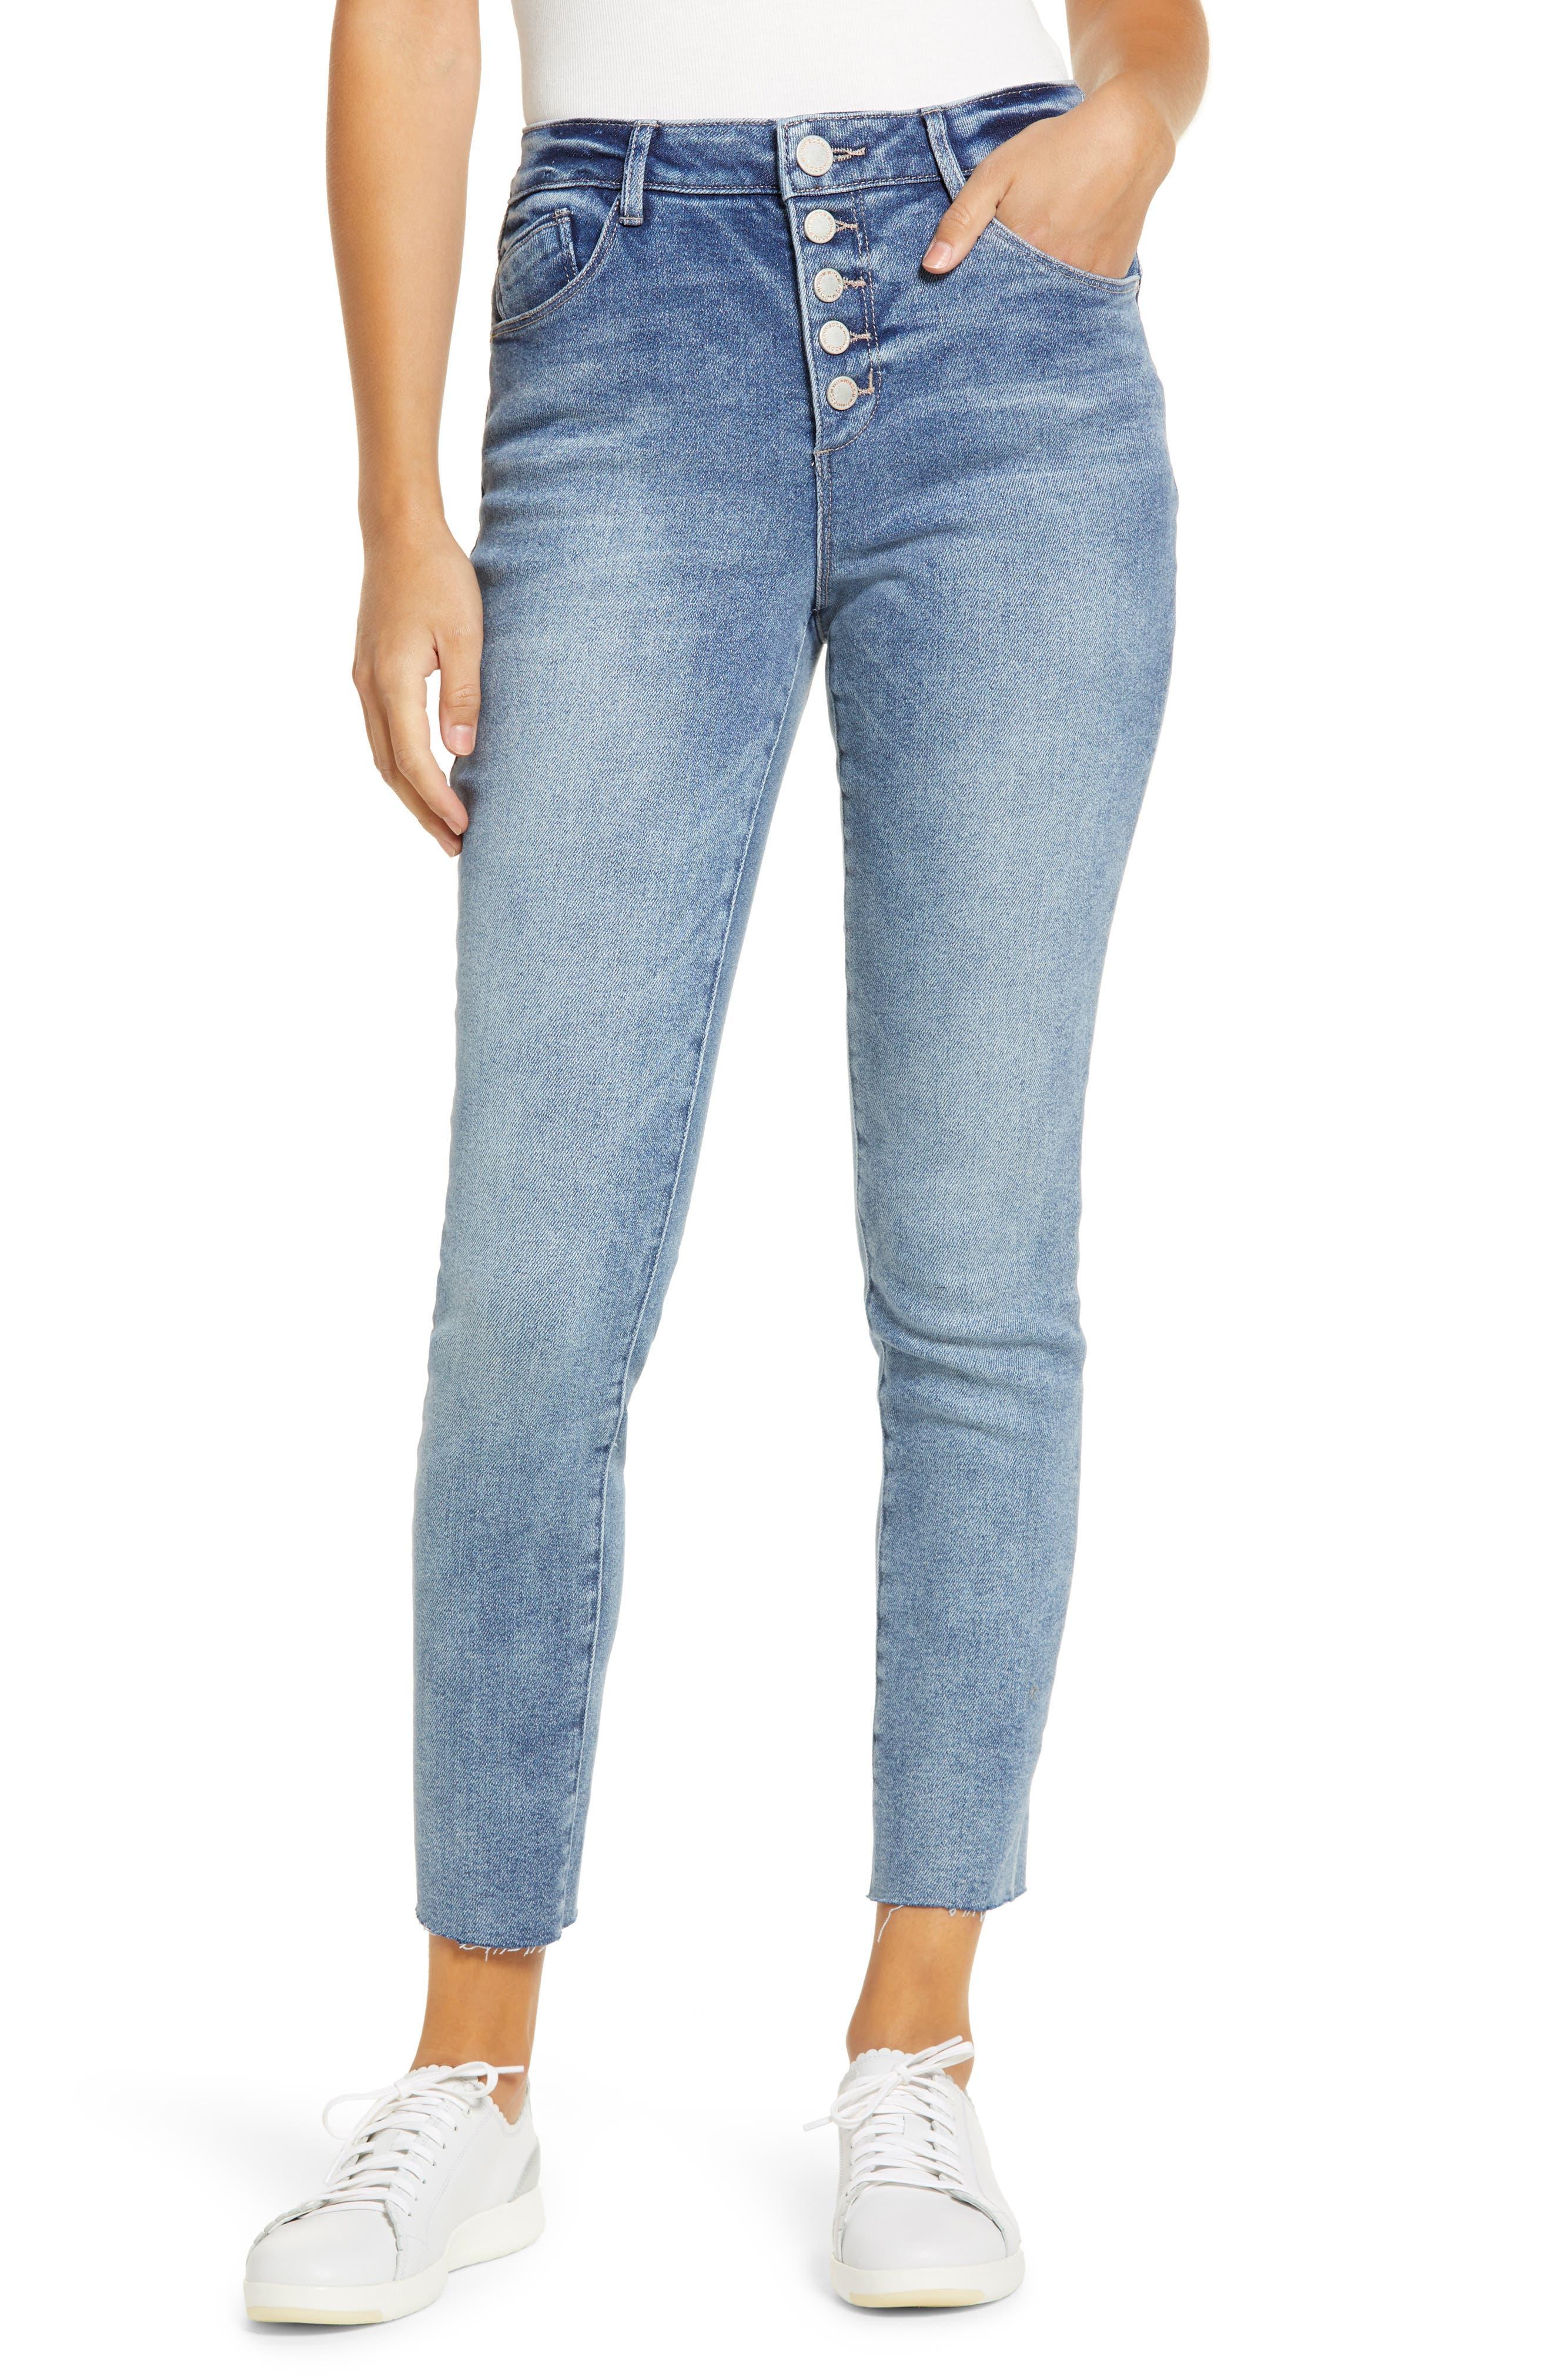 Wit & Wisdom Ab-Solution High Waist Crop Skinny Jeans (Regular & Petite) (Nordstrom Exclusive) | Nordstrom